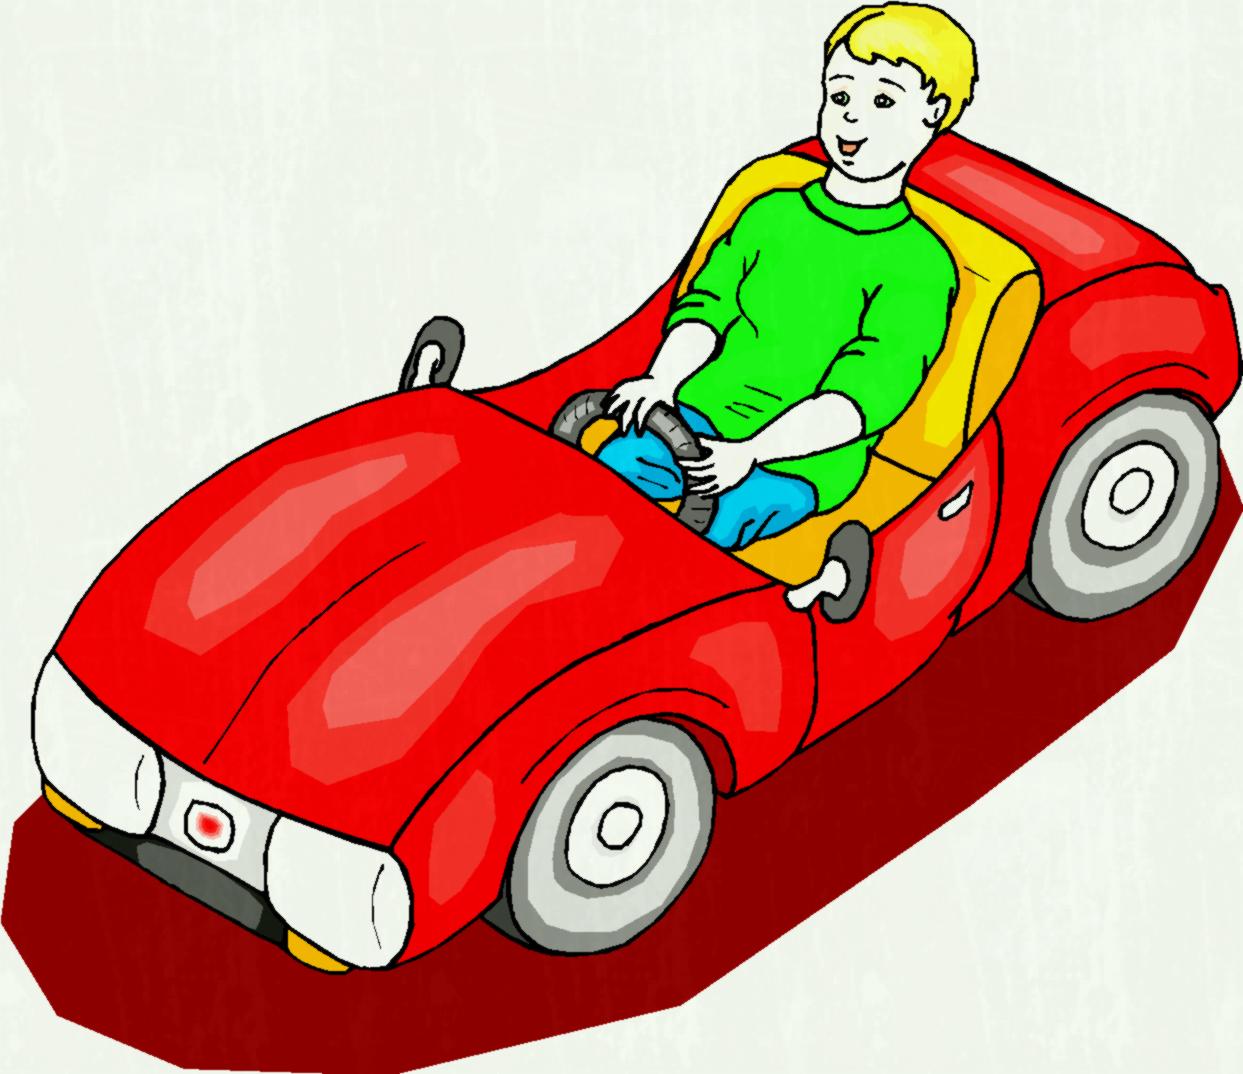 1243x1074 Boy In A Toy Car Stock Vector Royalty Free Cliparts Vectors